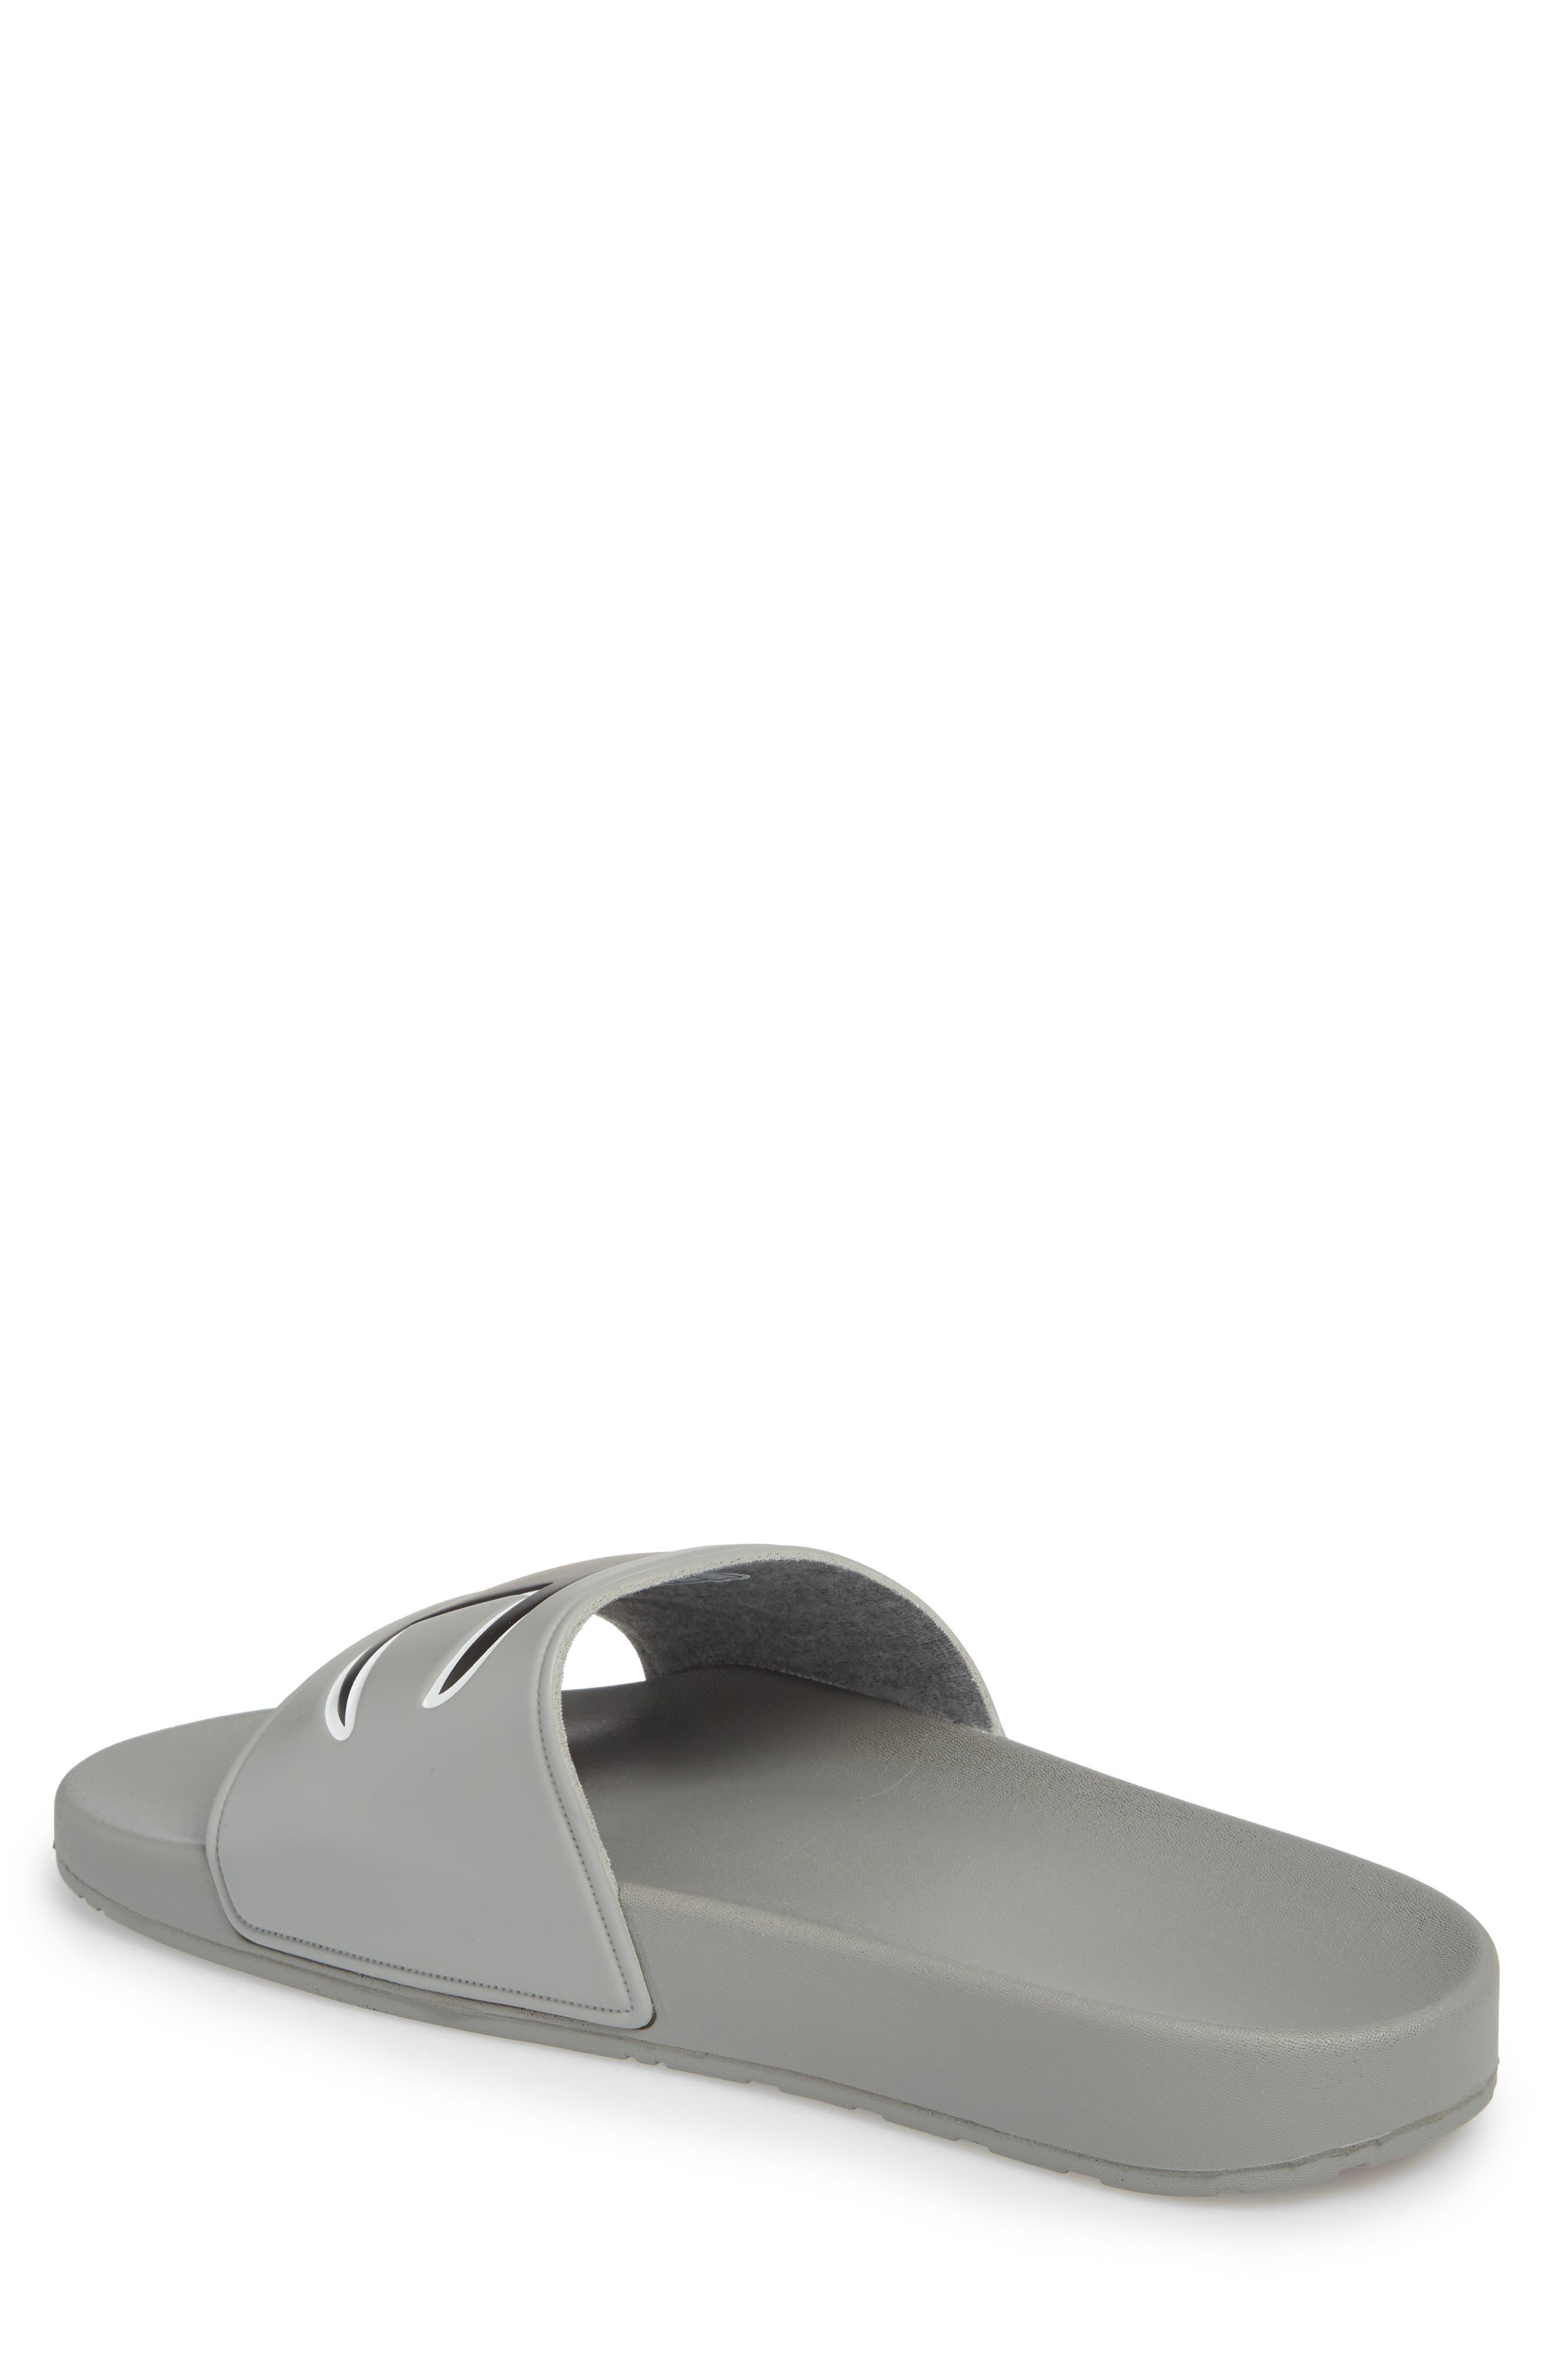 IPO Sports Slide Sandal,                             Alternate thumbnail 2, color,                             GREY